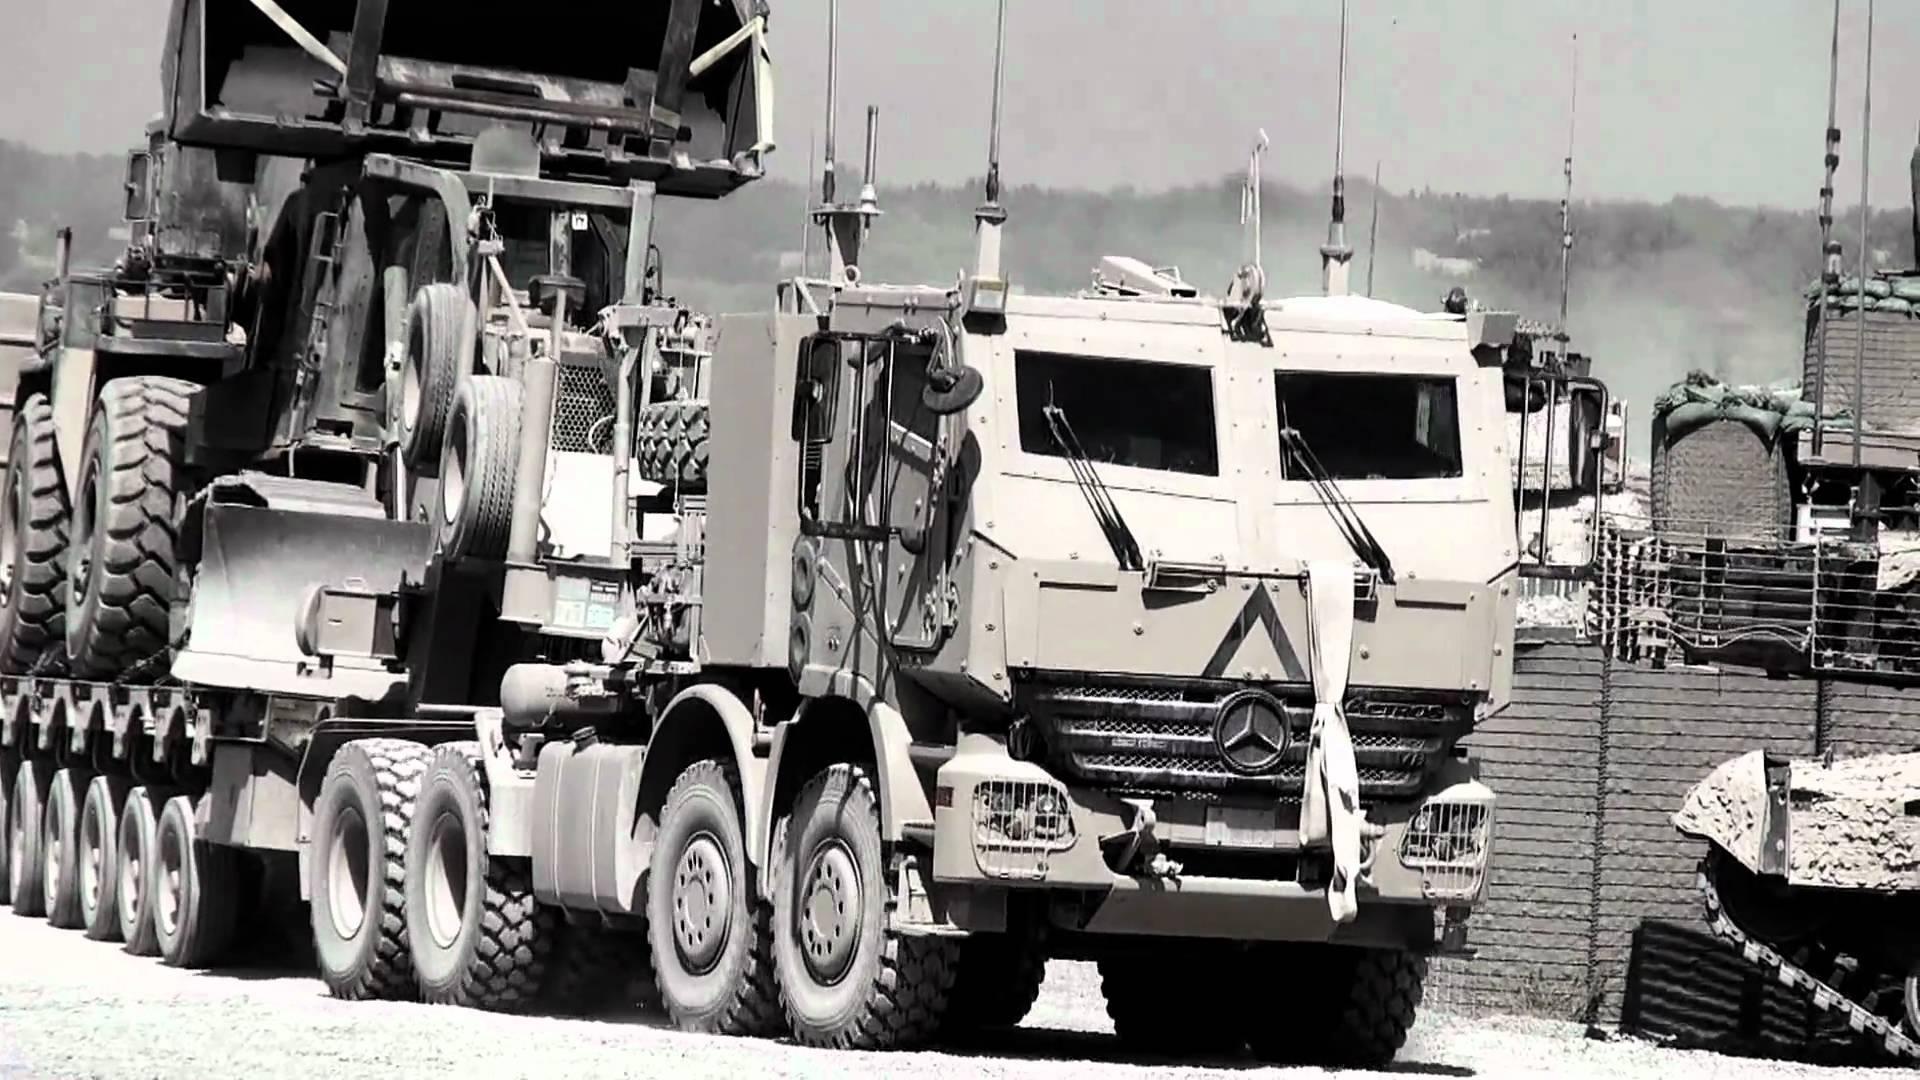 Mercedes-Acros-De-afghaanse-oorlog-was-in-het-canadese-leger-actros-gepantserde-truck